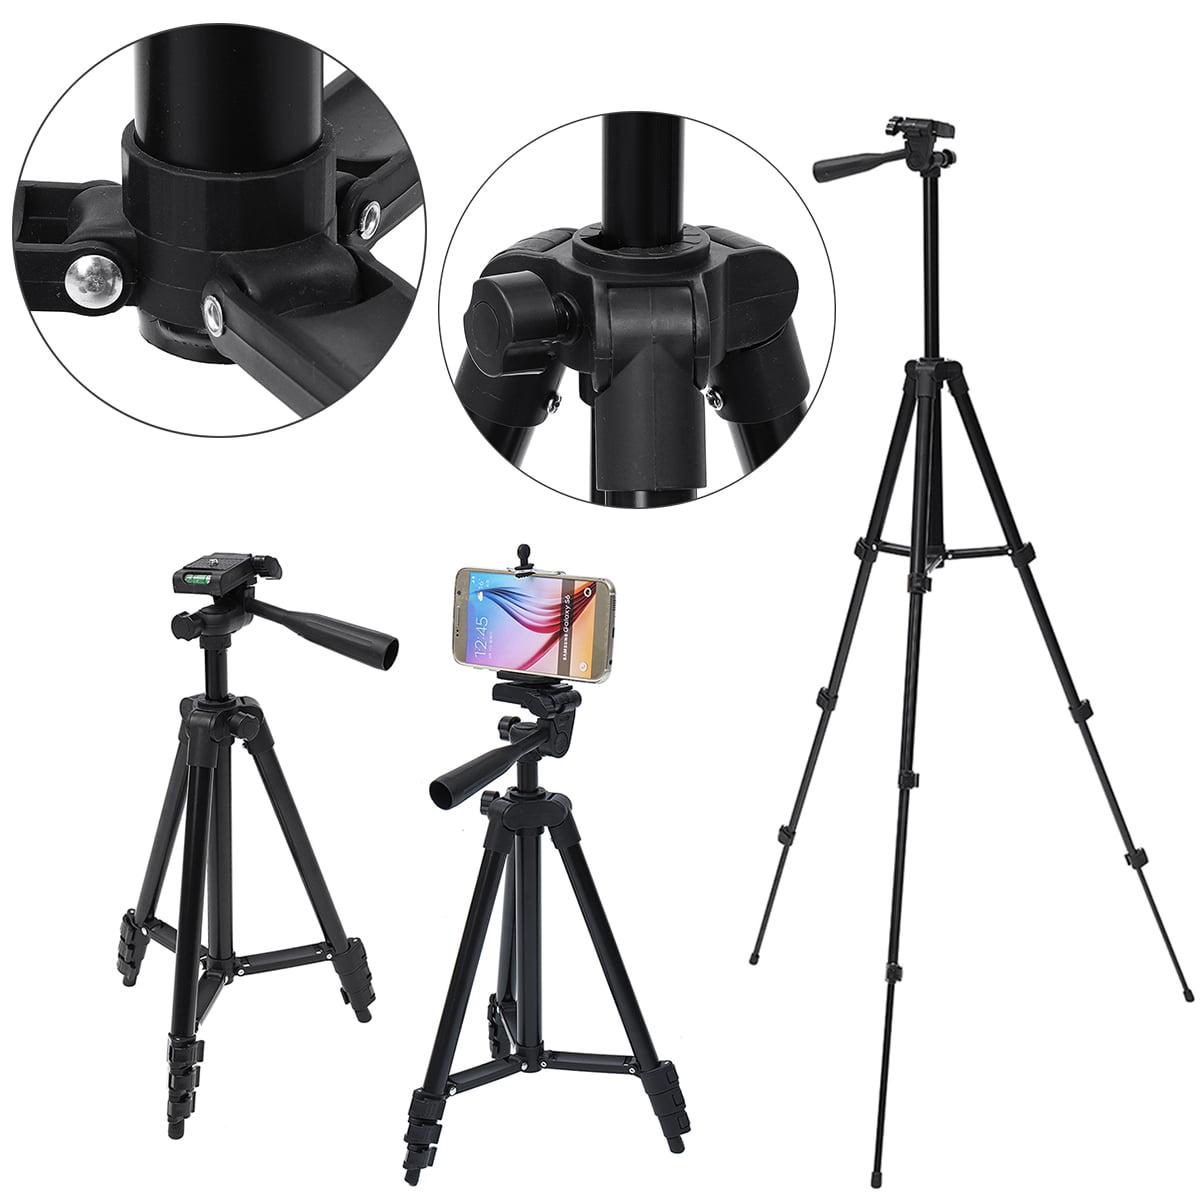 Universal Professional Aluminum Telescopic Camera Tripod Stand Holder